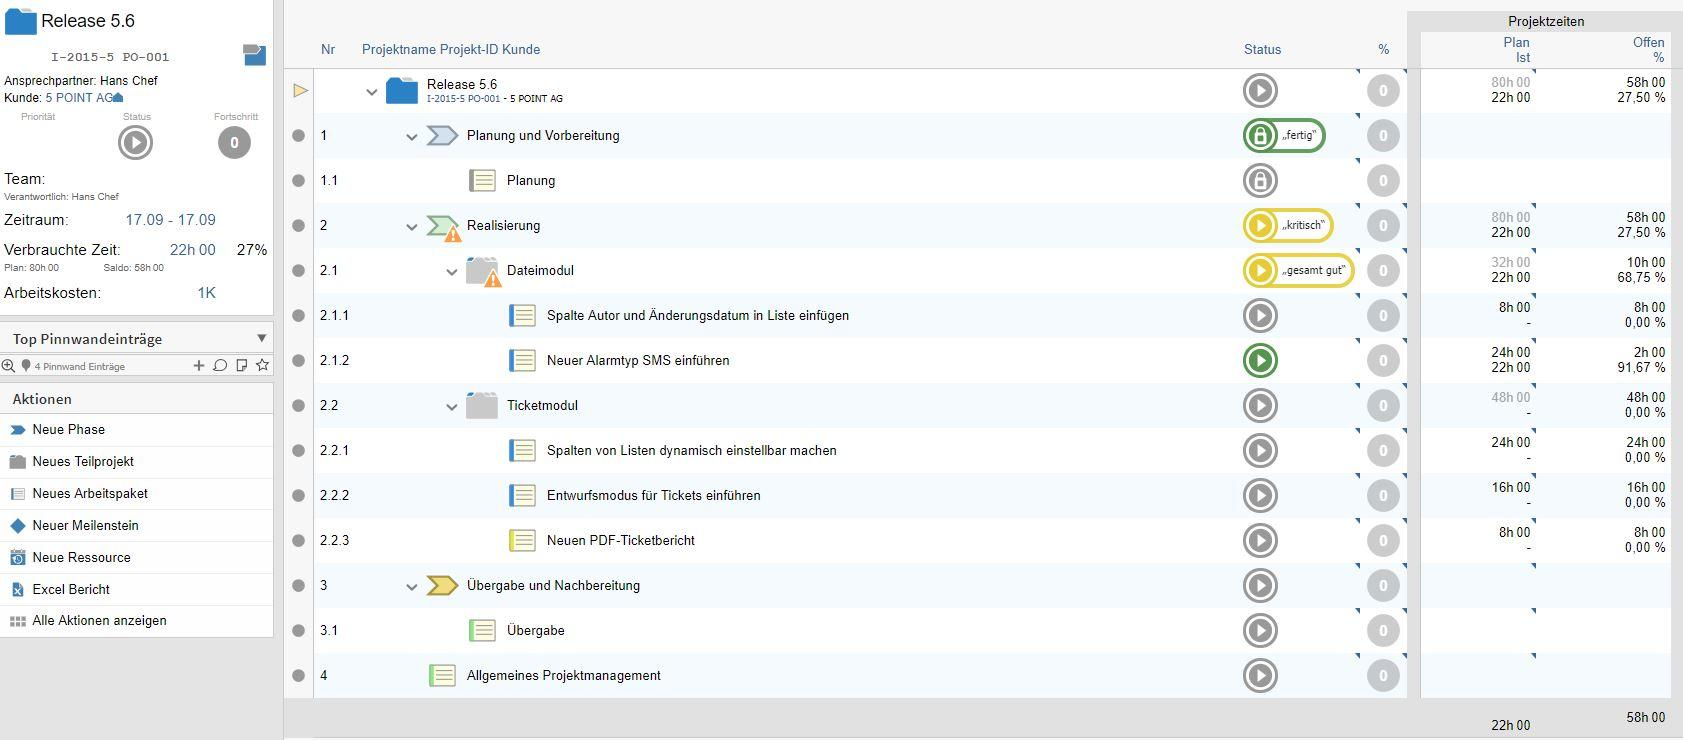 Projektstatus in projectfacts